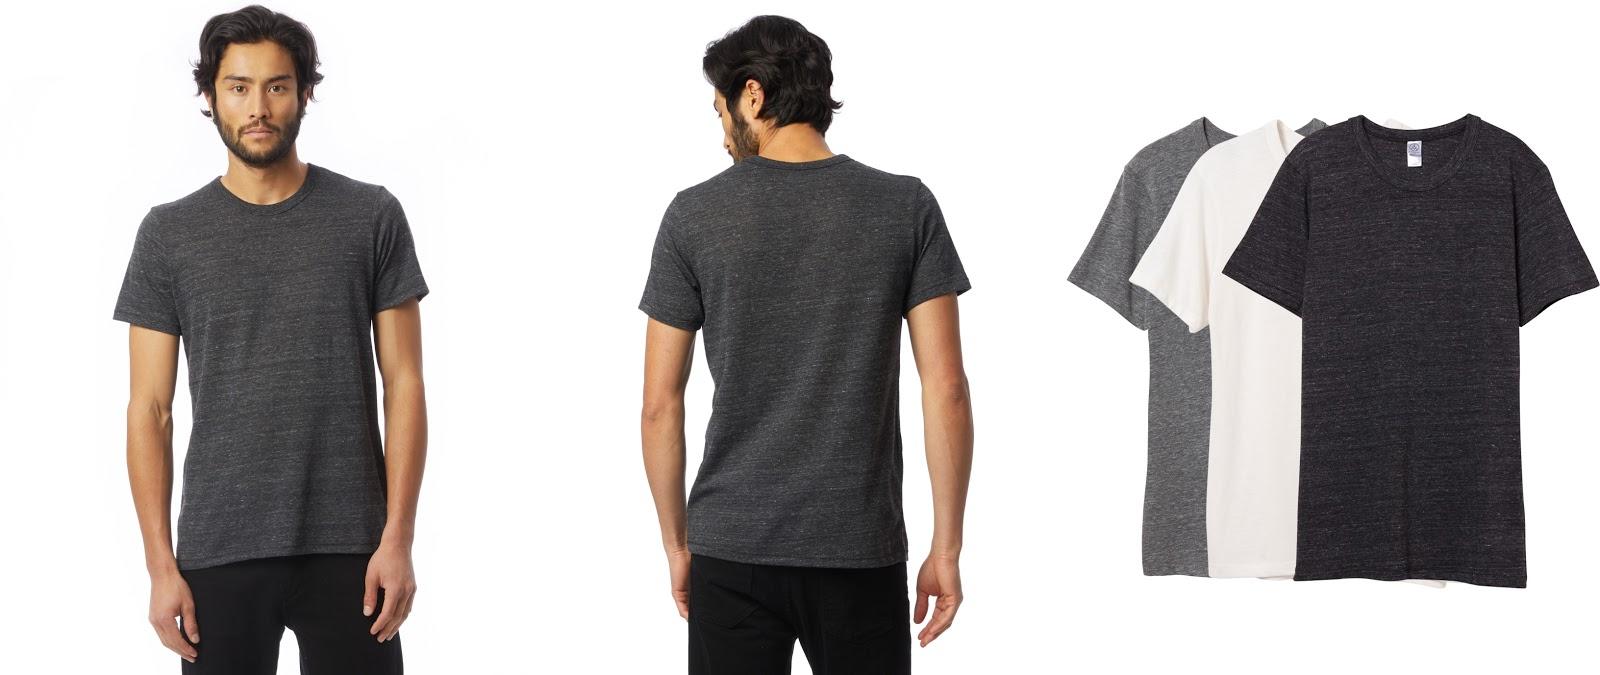 Alternative Apparel Eco-Jersey Crew T-Shirt in Eco Black